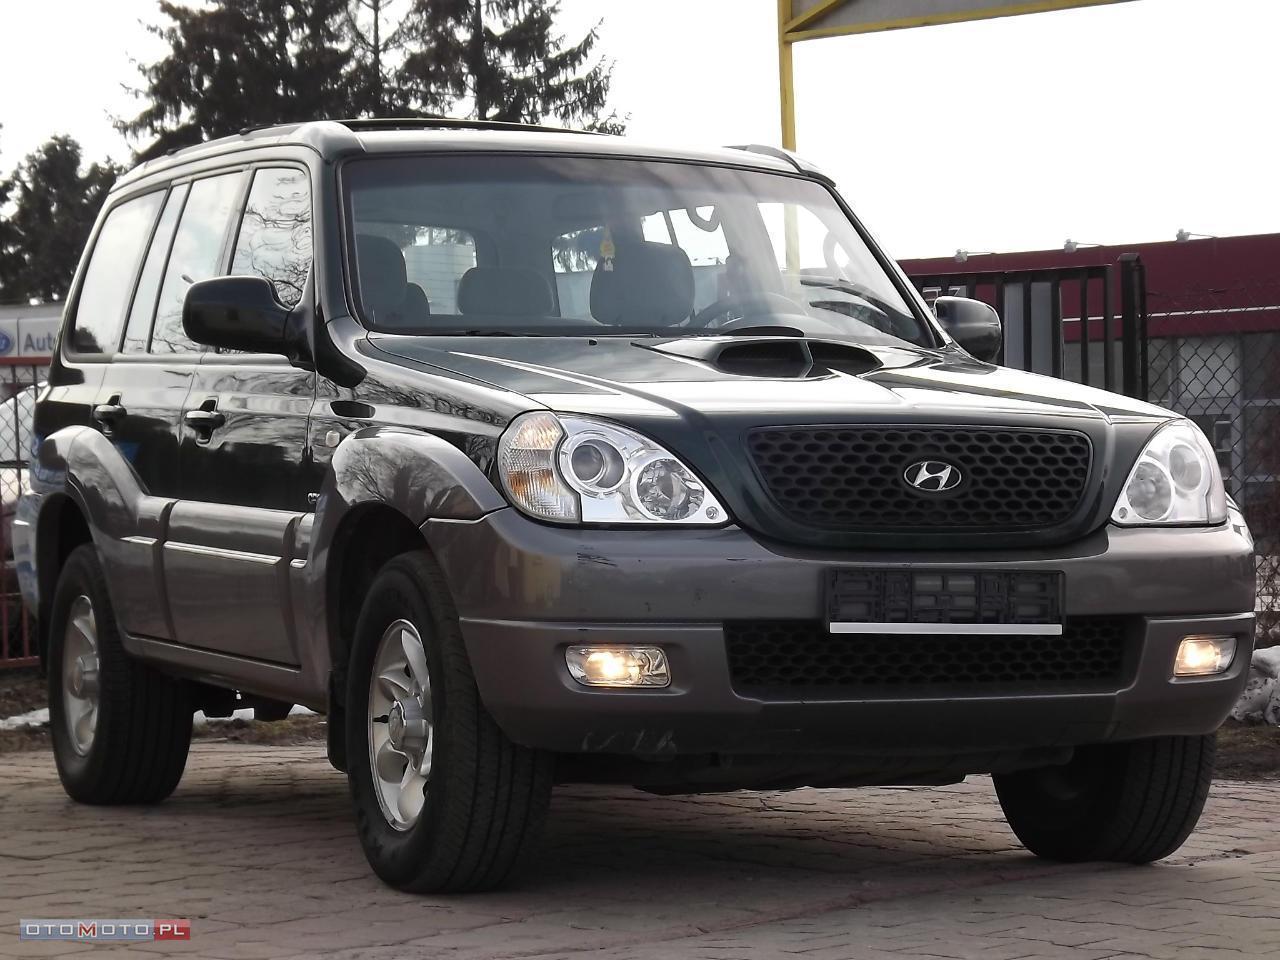 Hyundai Terracan 4x4*KLIMA